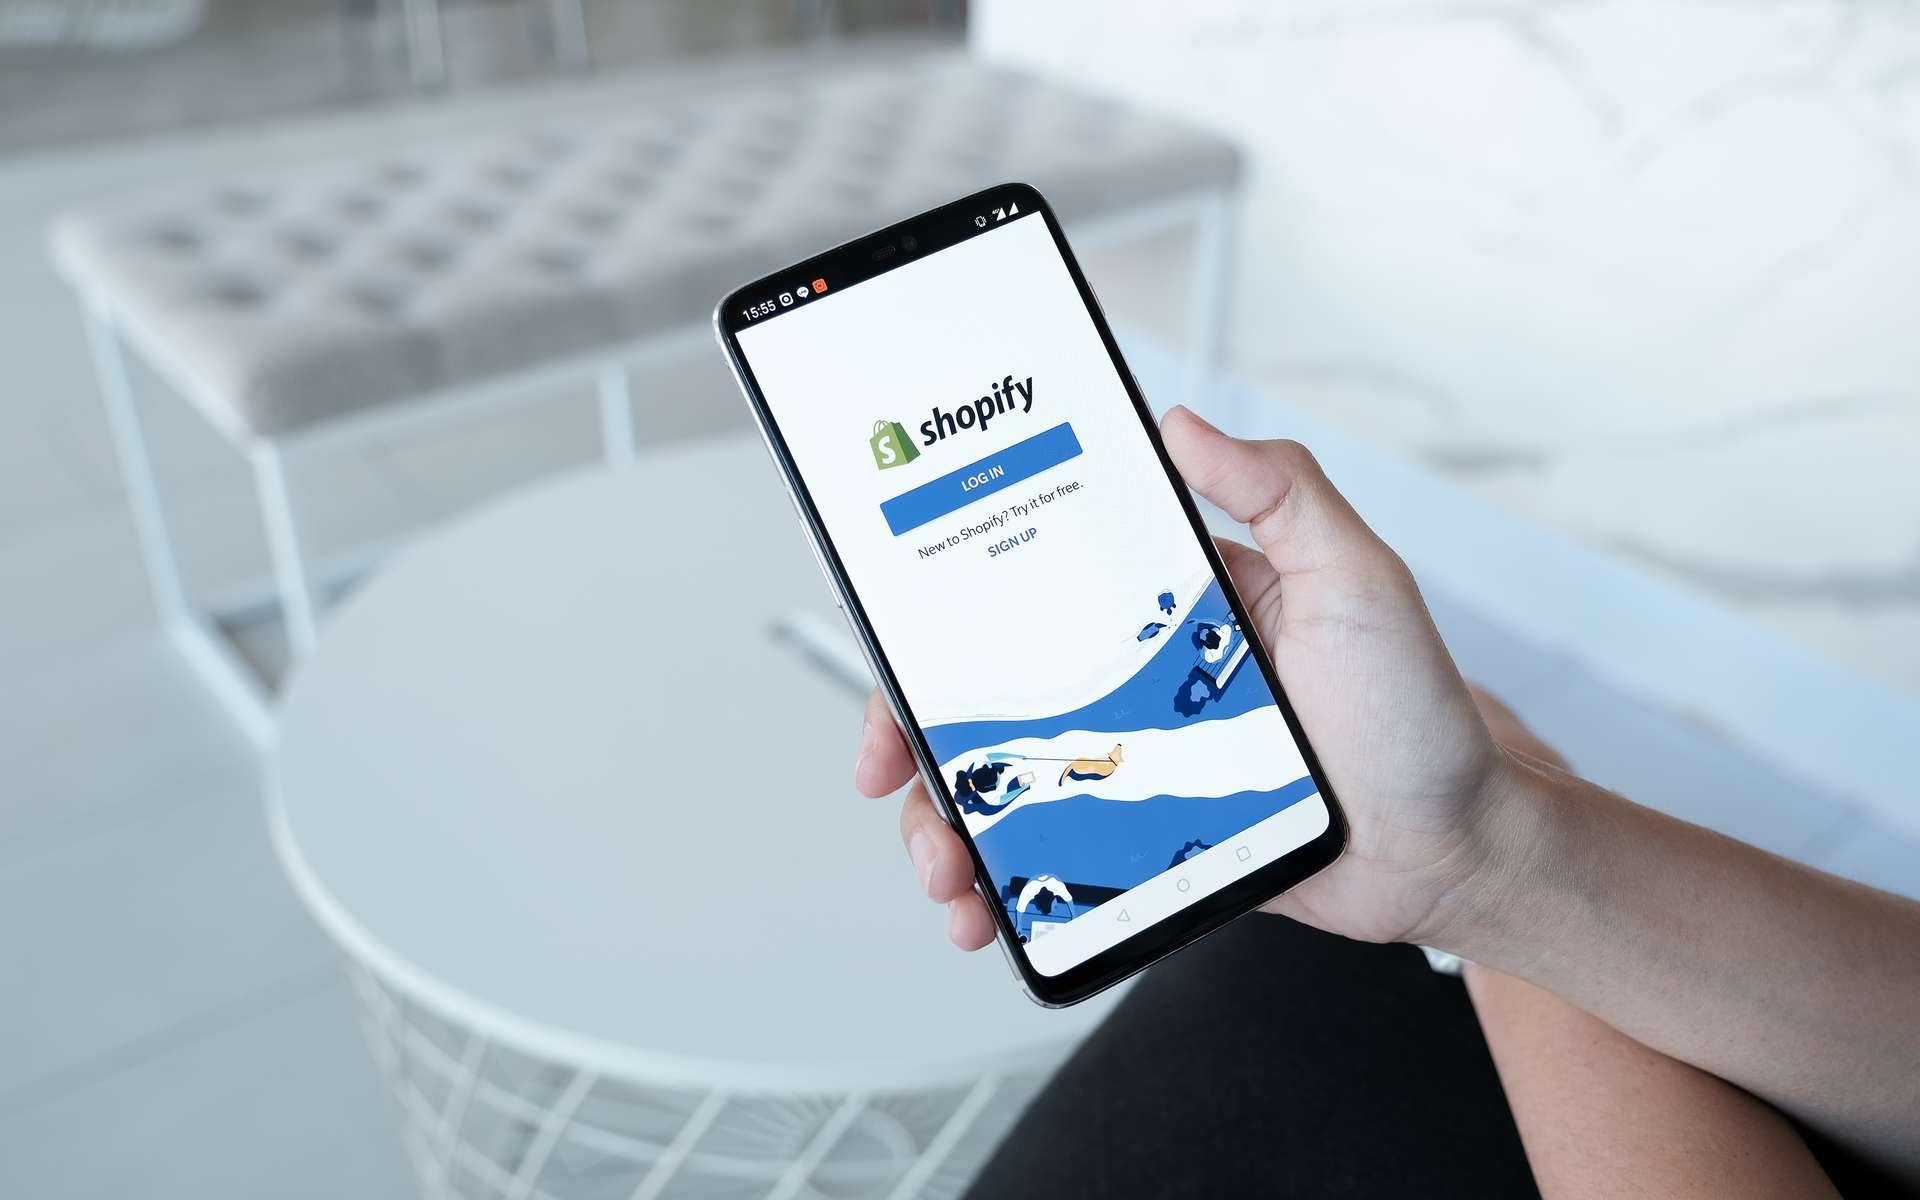 Logo Shopify. © Jirapong, Adobe Stock